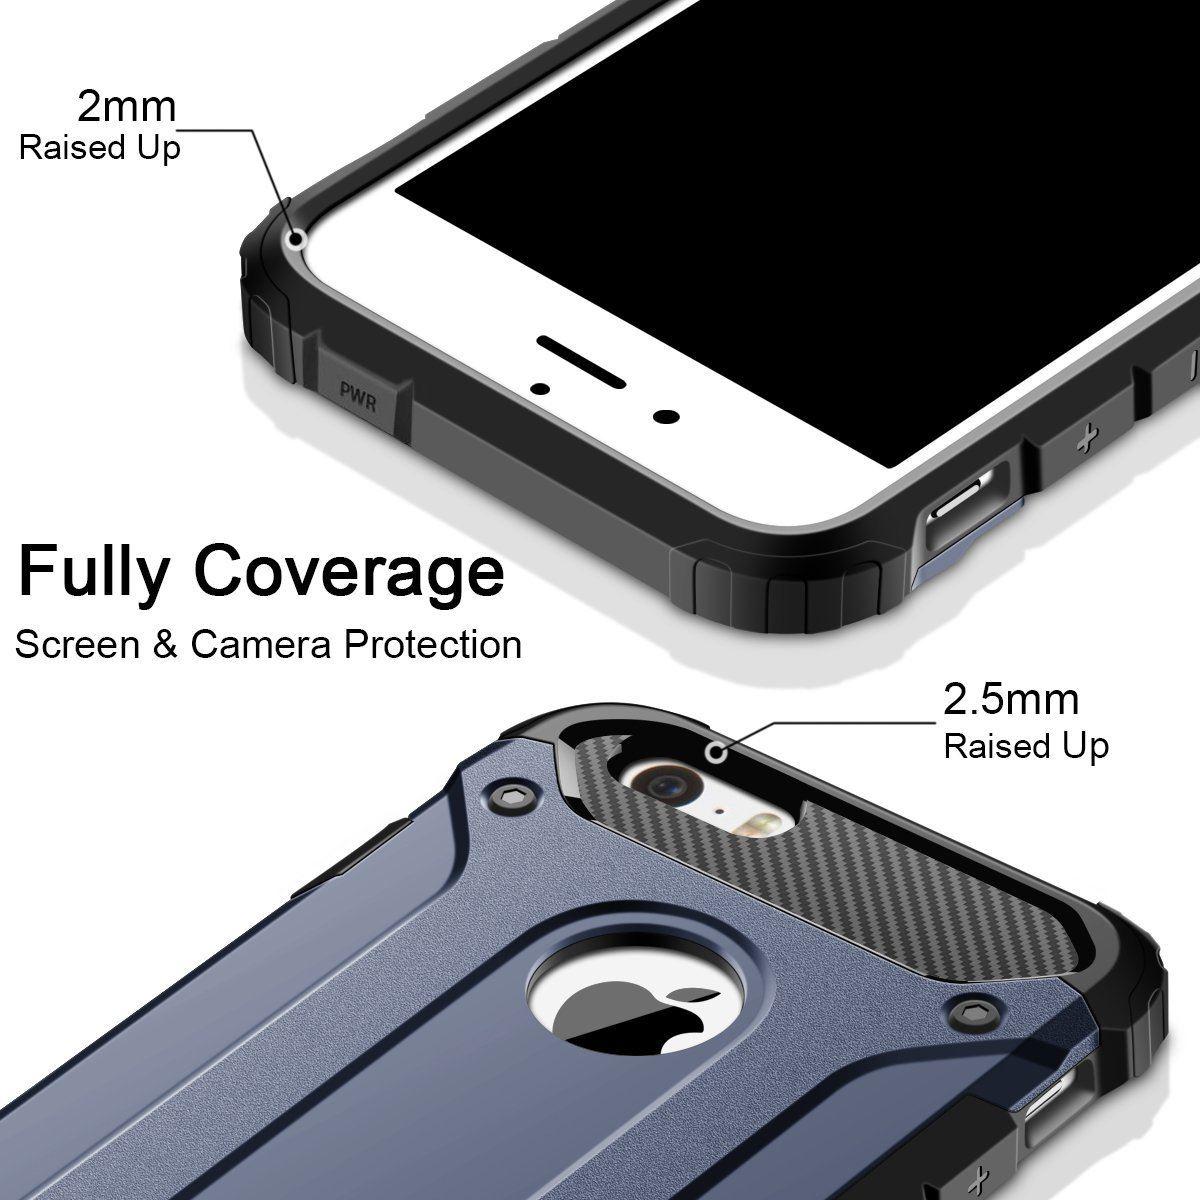 thumbnail 59 - For Apple iPhone 11 Pro Max XR Xs X 8 7 Plus 6 5 Se Case Cover Tough Armor